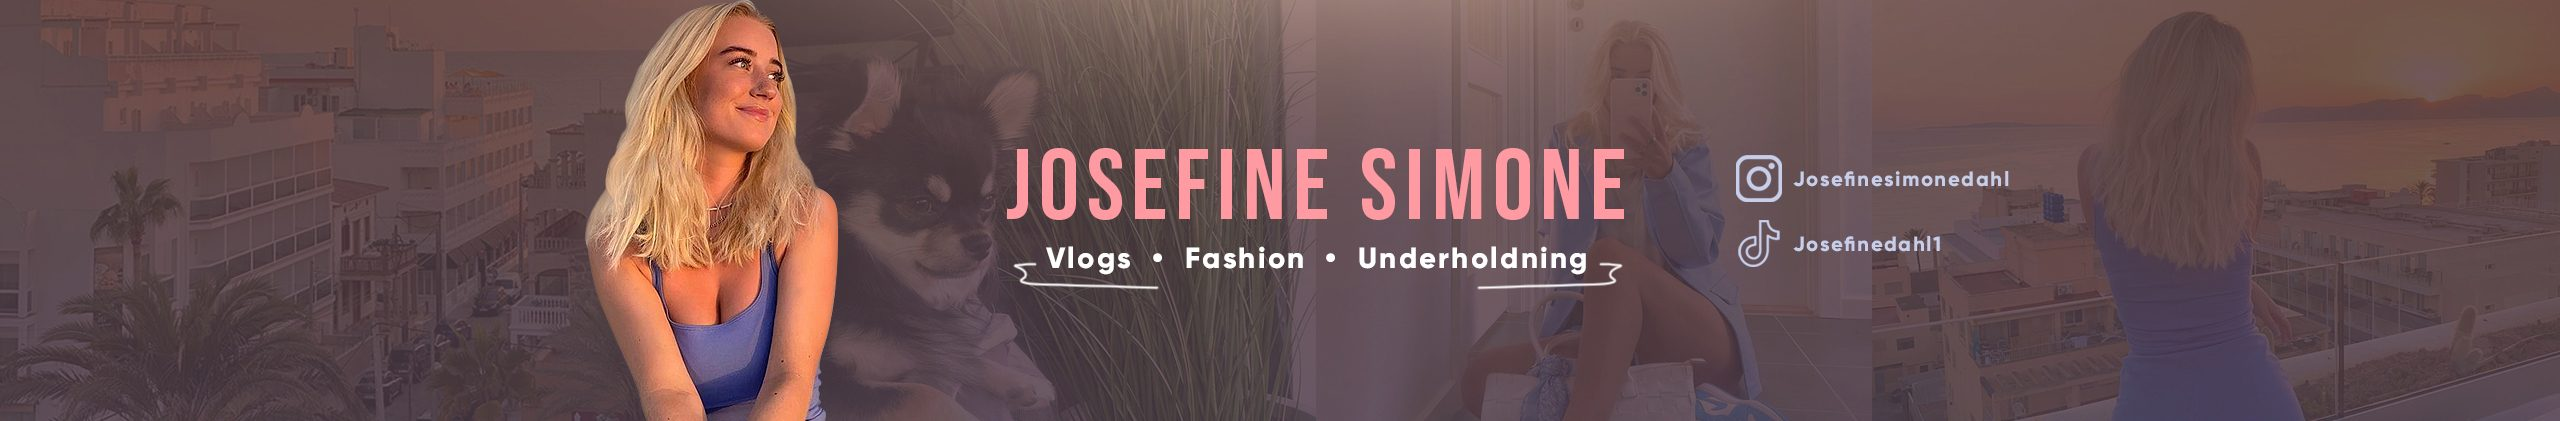 Josefine Simone